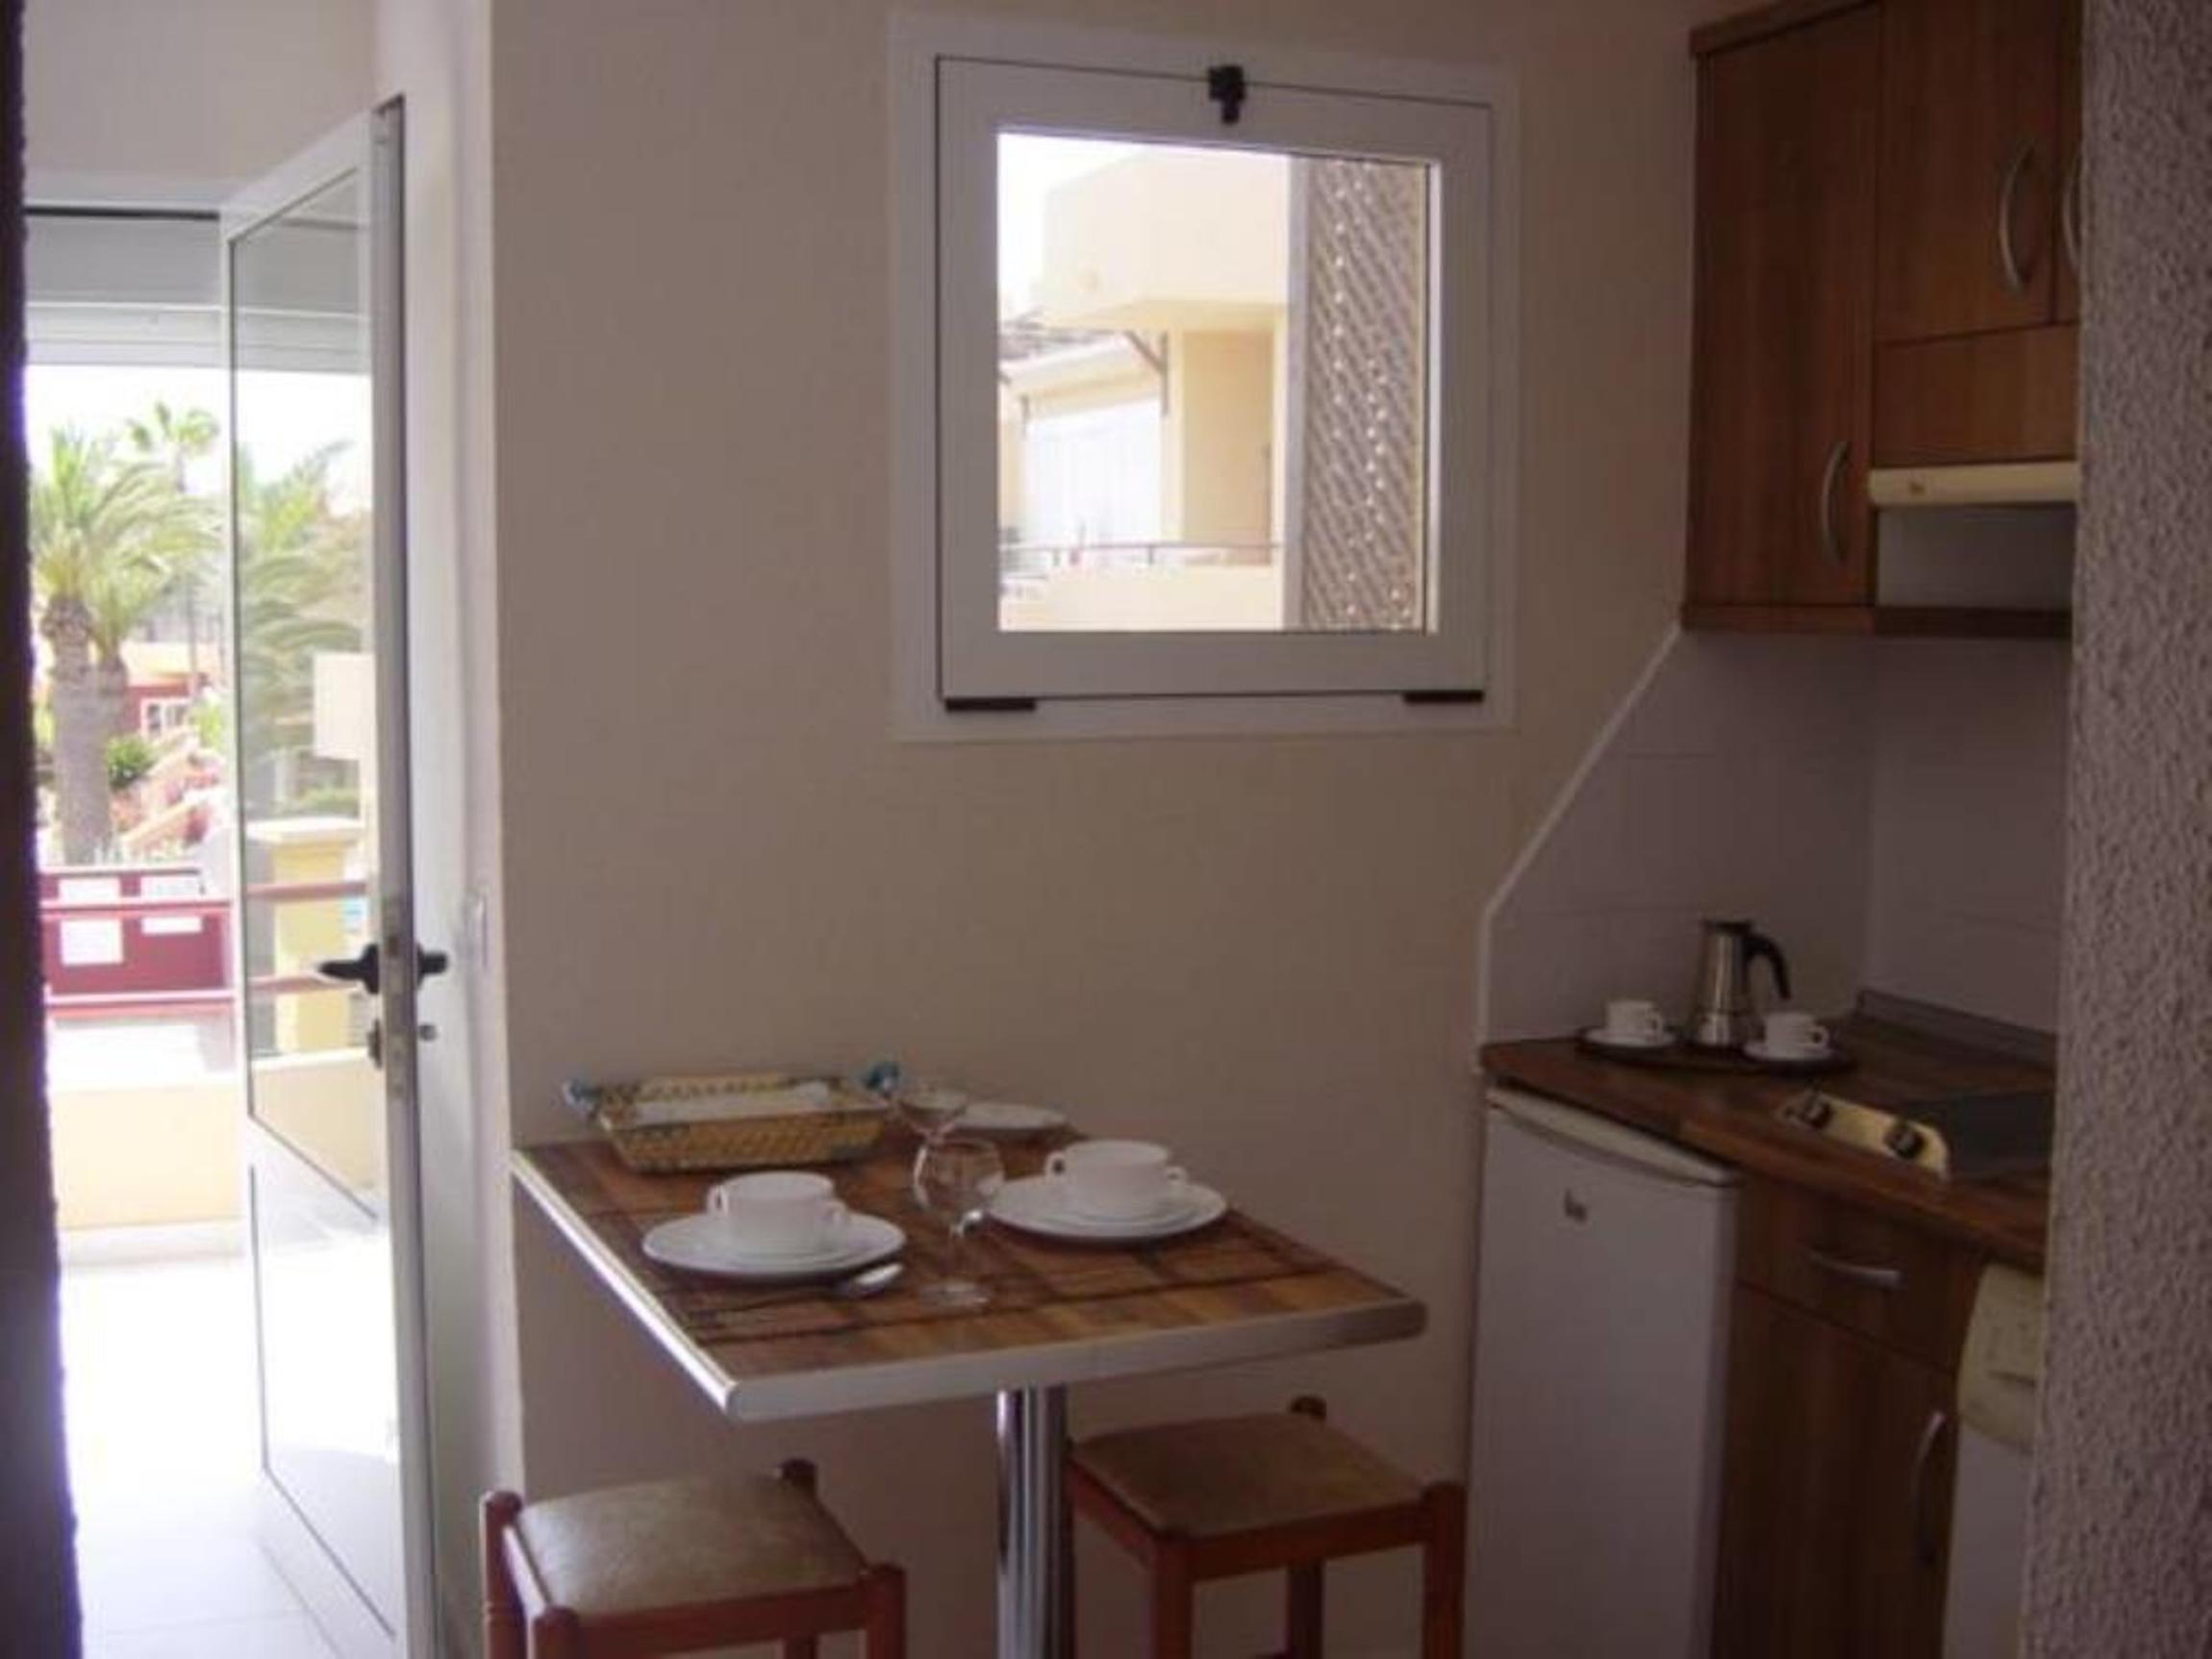 Ferienwohnung Wohnung El Mirador -Residencial Las Dunas - (2196686), Corralejo, Fuerteventura, Kanarische Inseln, Spanien, Bild 4